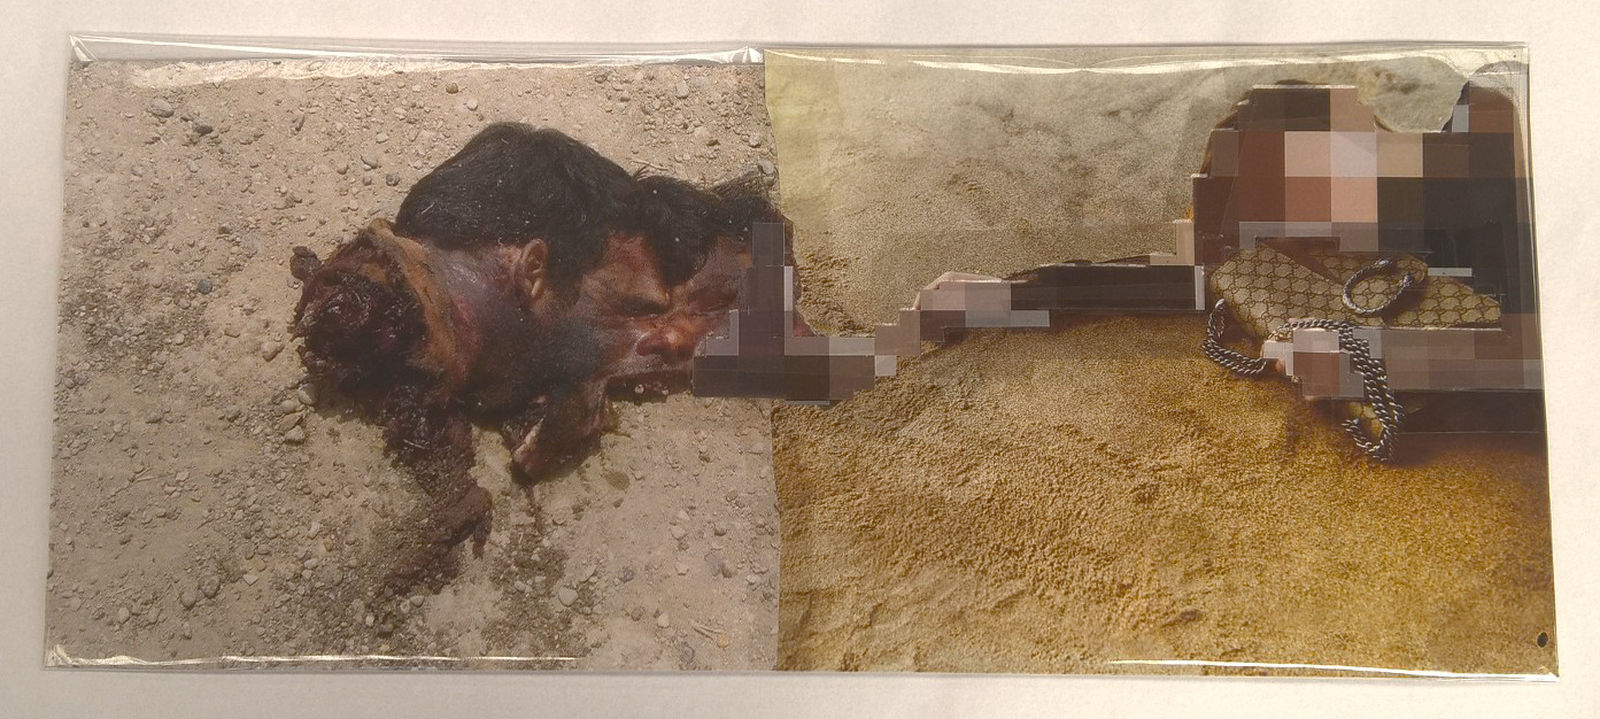 Pixel-Collage nº56, 2016, Prints, tape, transparent sheet, 19x44 cm